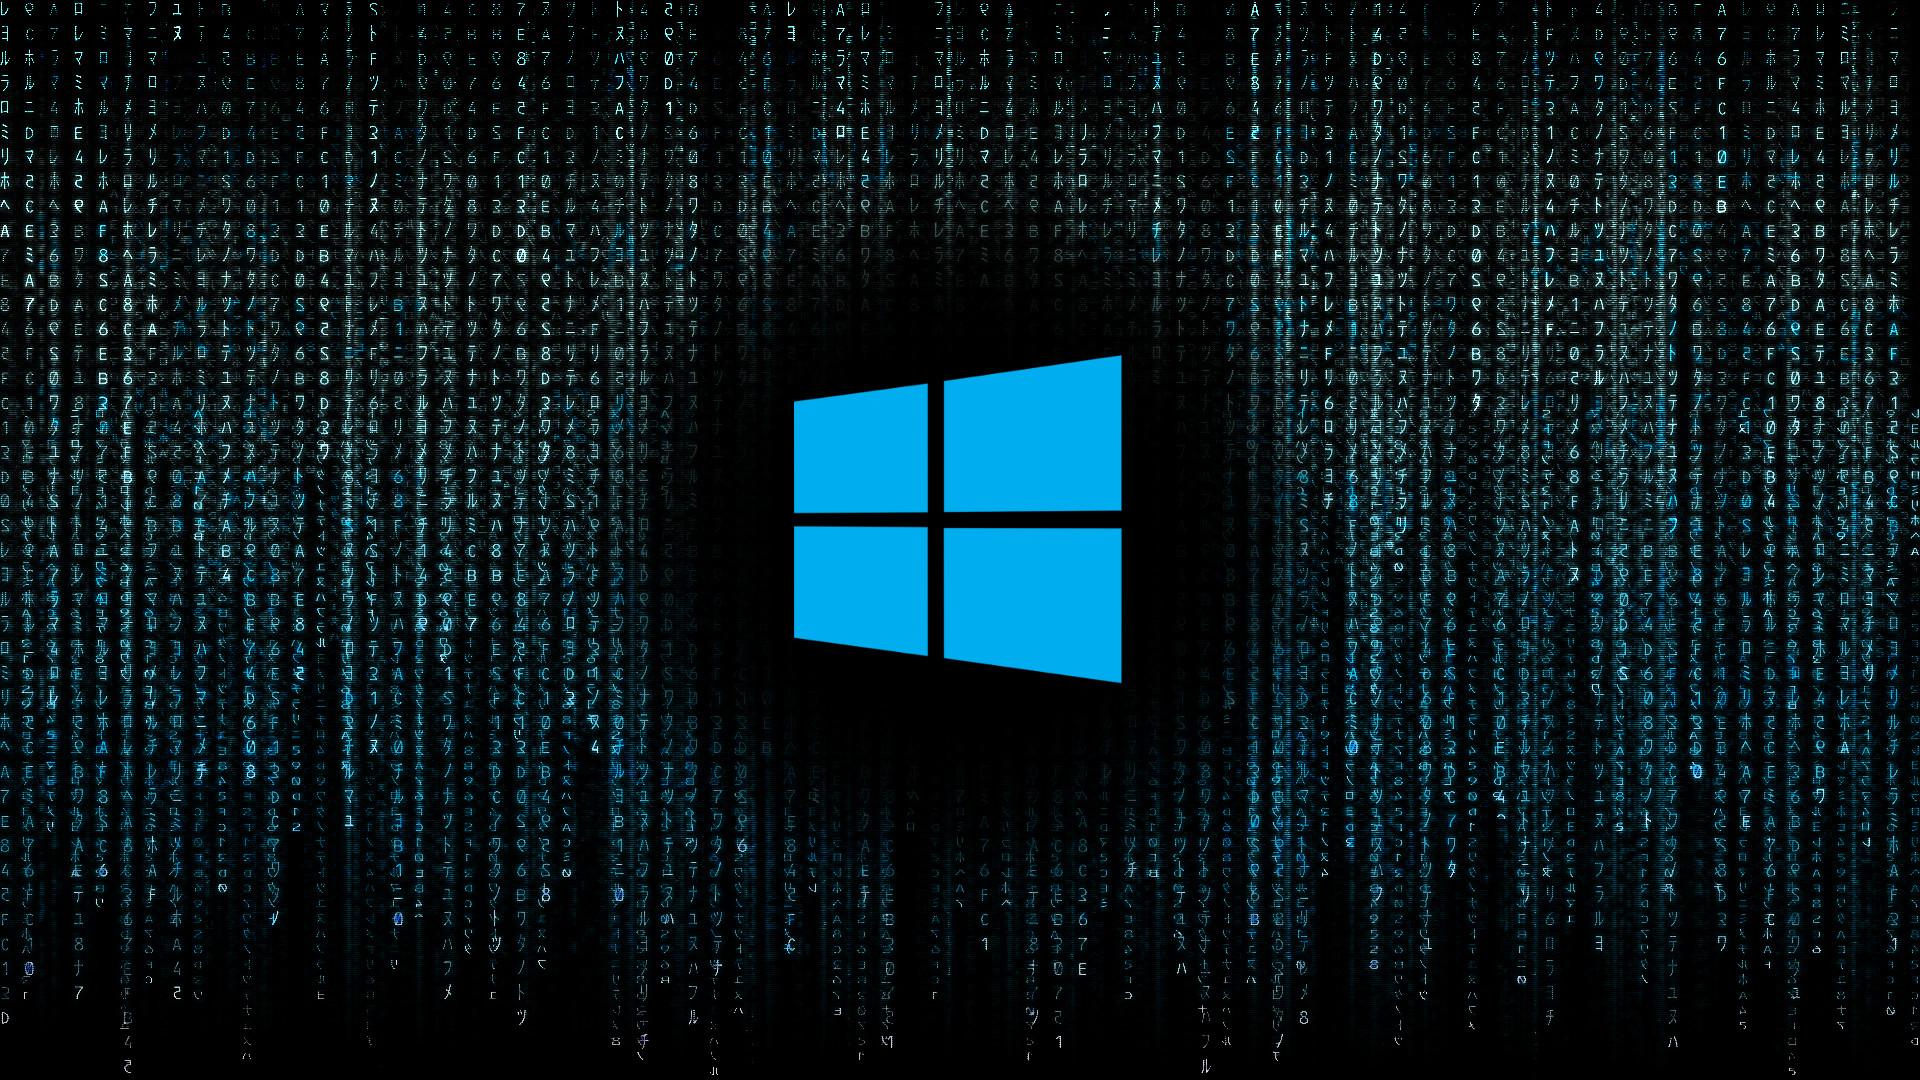 … Windows 10 Matrix – Original by DigitalRain84